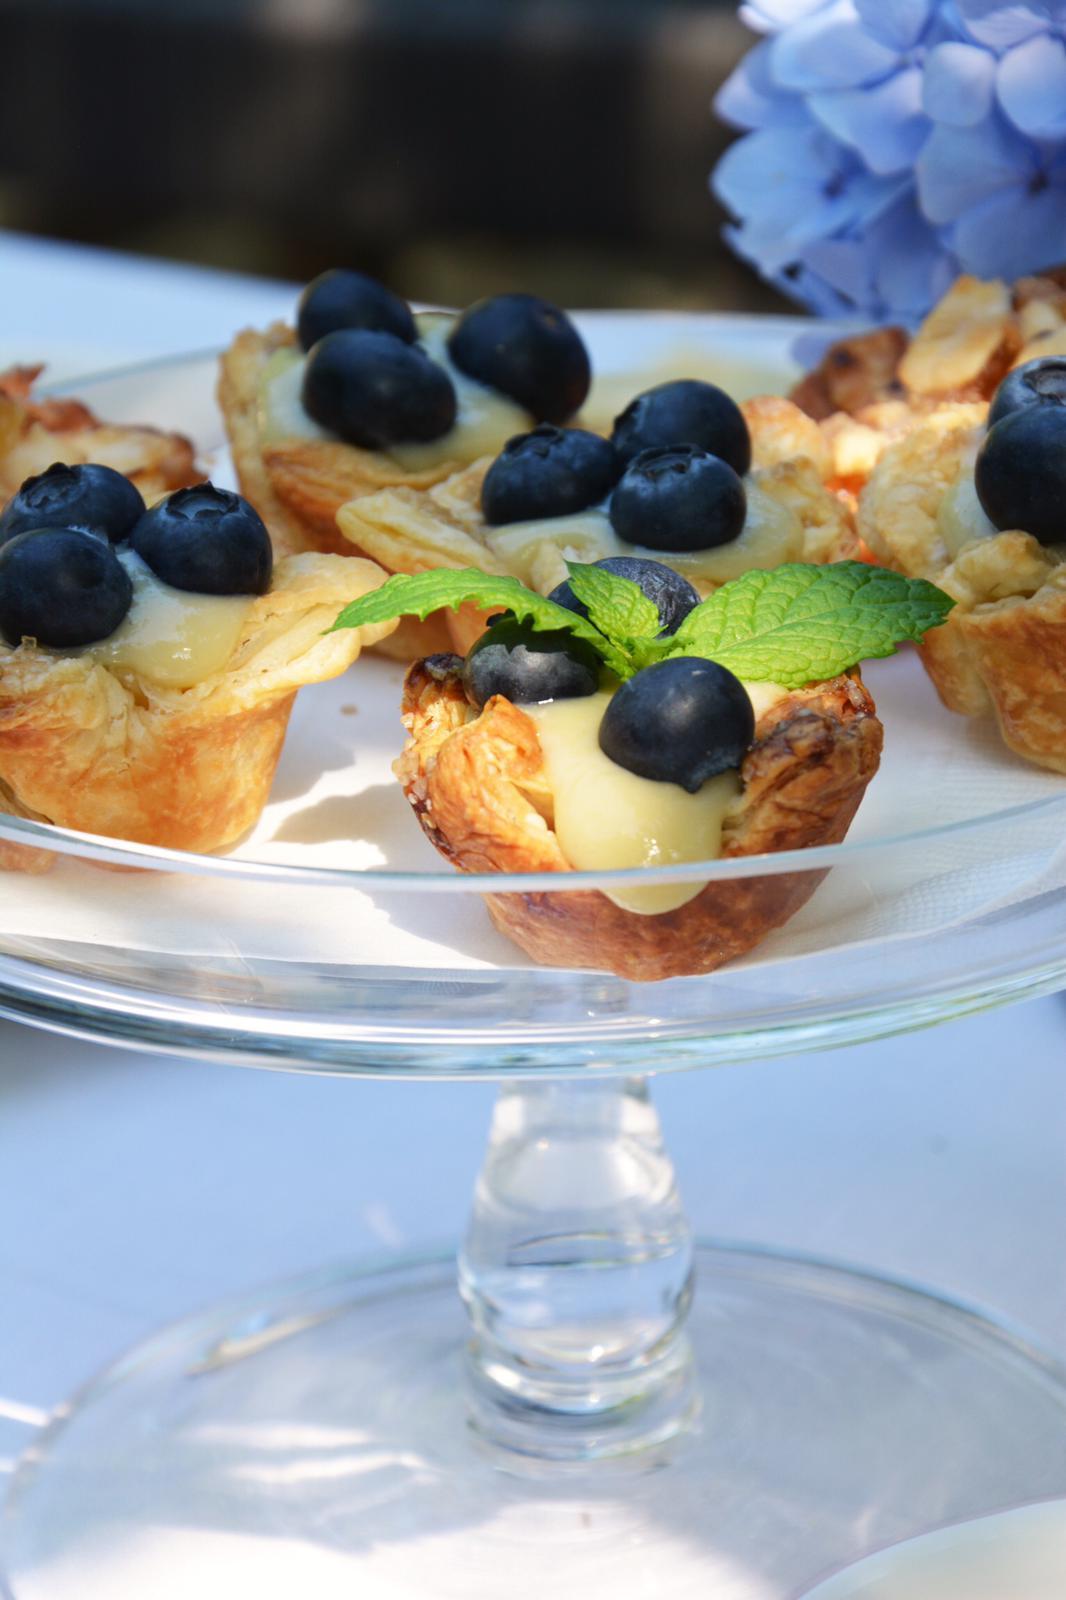 Blueberry Tarts with Lemon & Lavender Pastry Cream